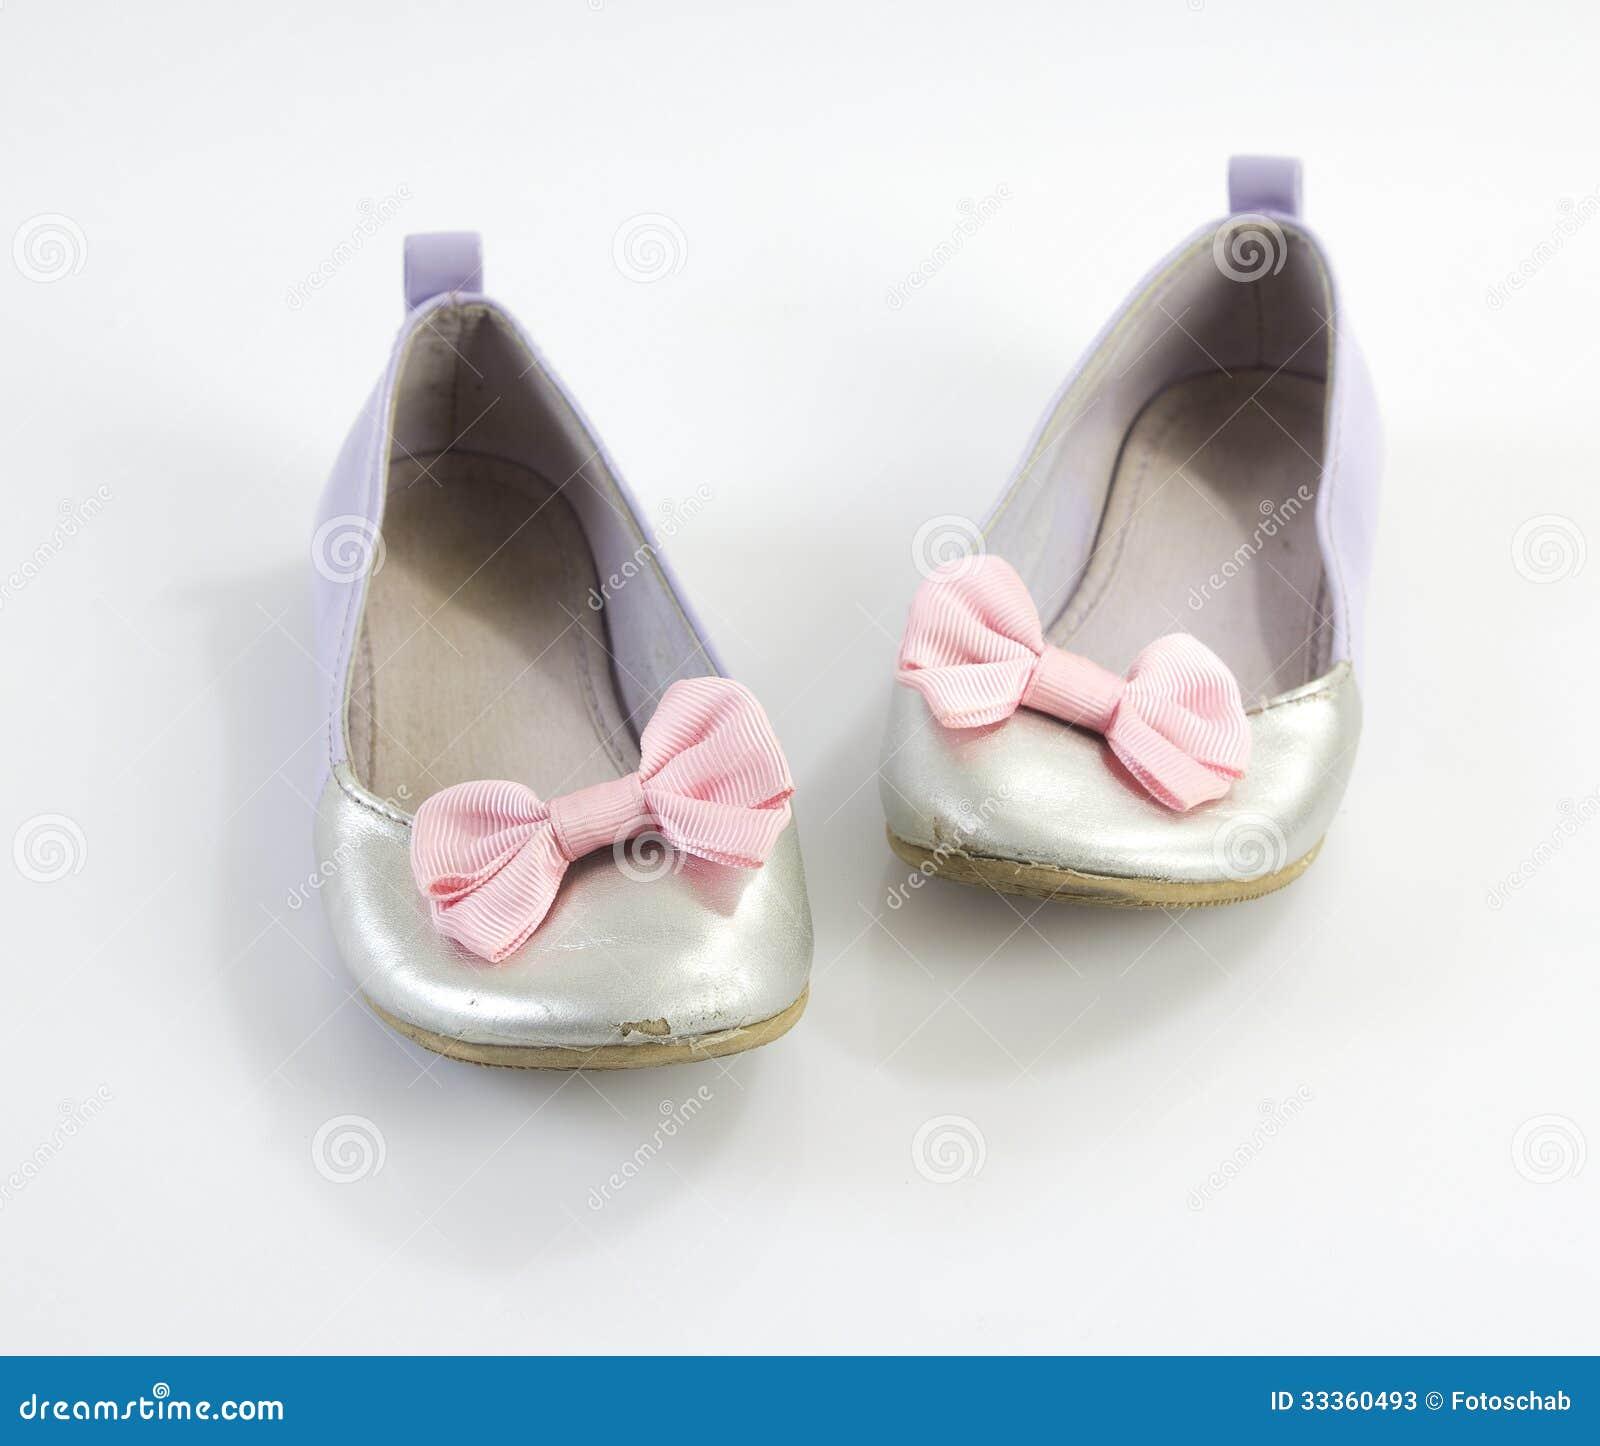 Stock Photos: Little girls shoes